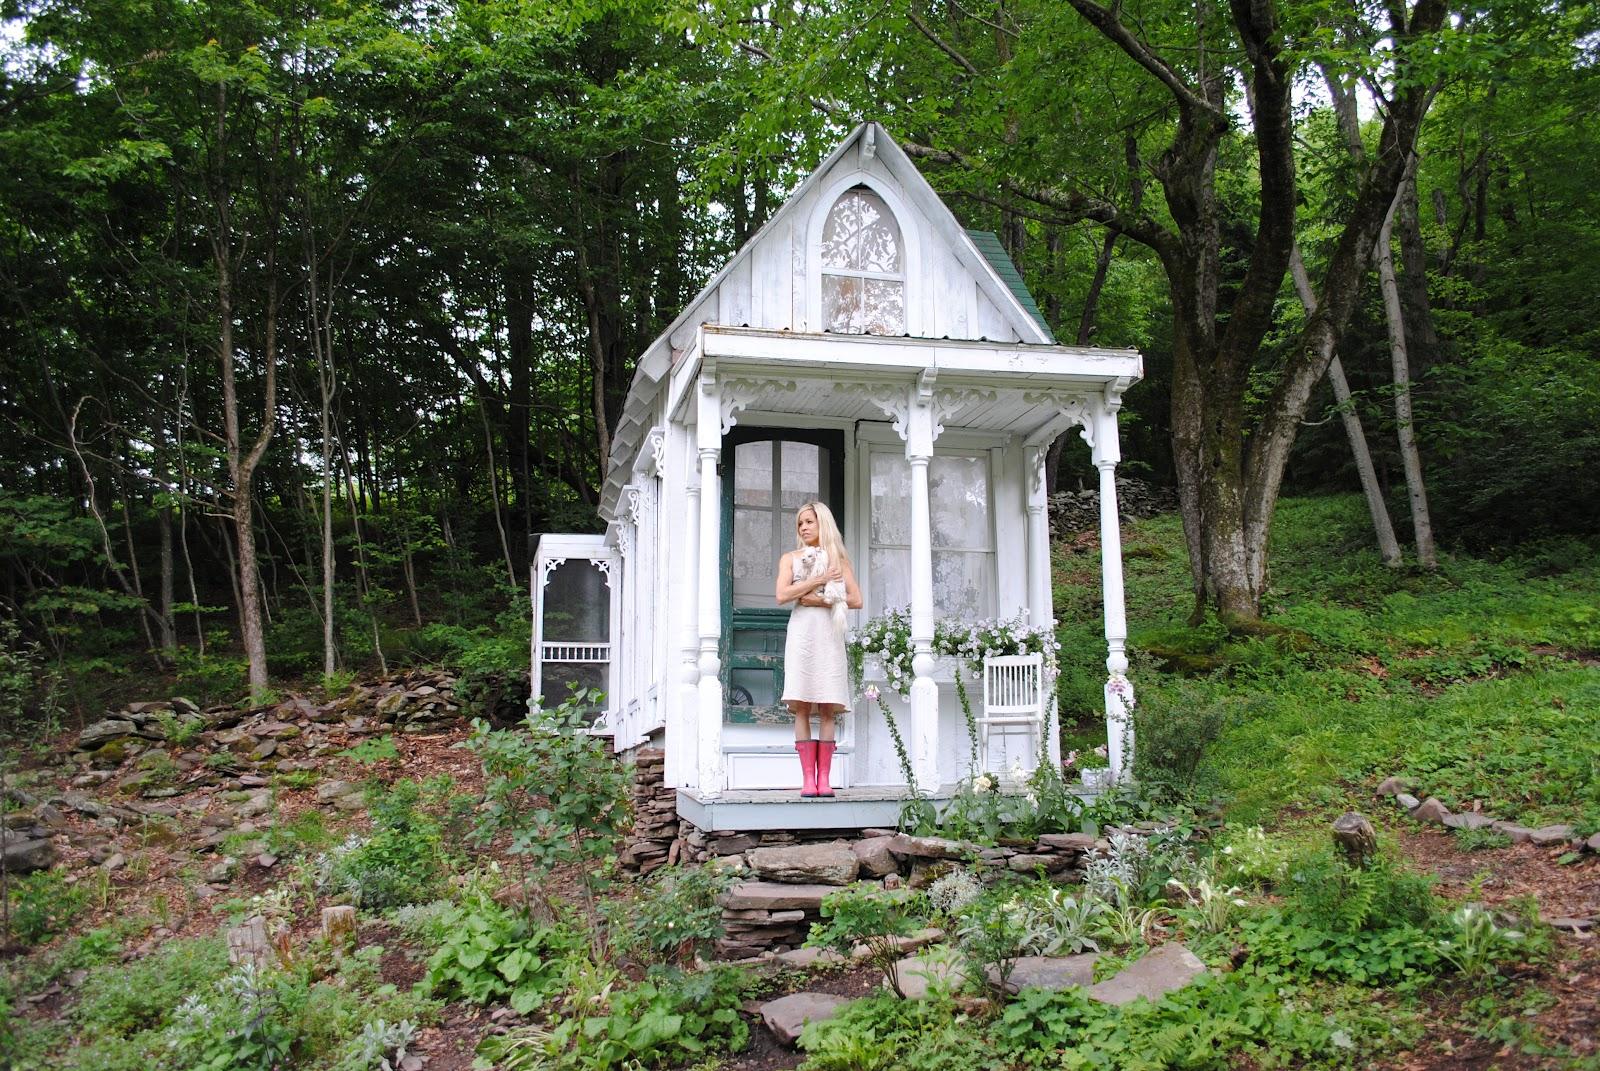 Relaxshacks Ten More Wild Tiny Houses Great Examples